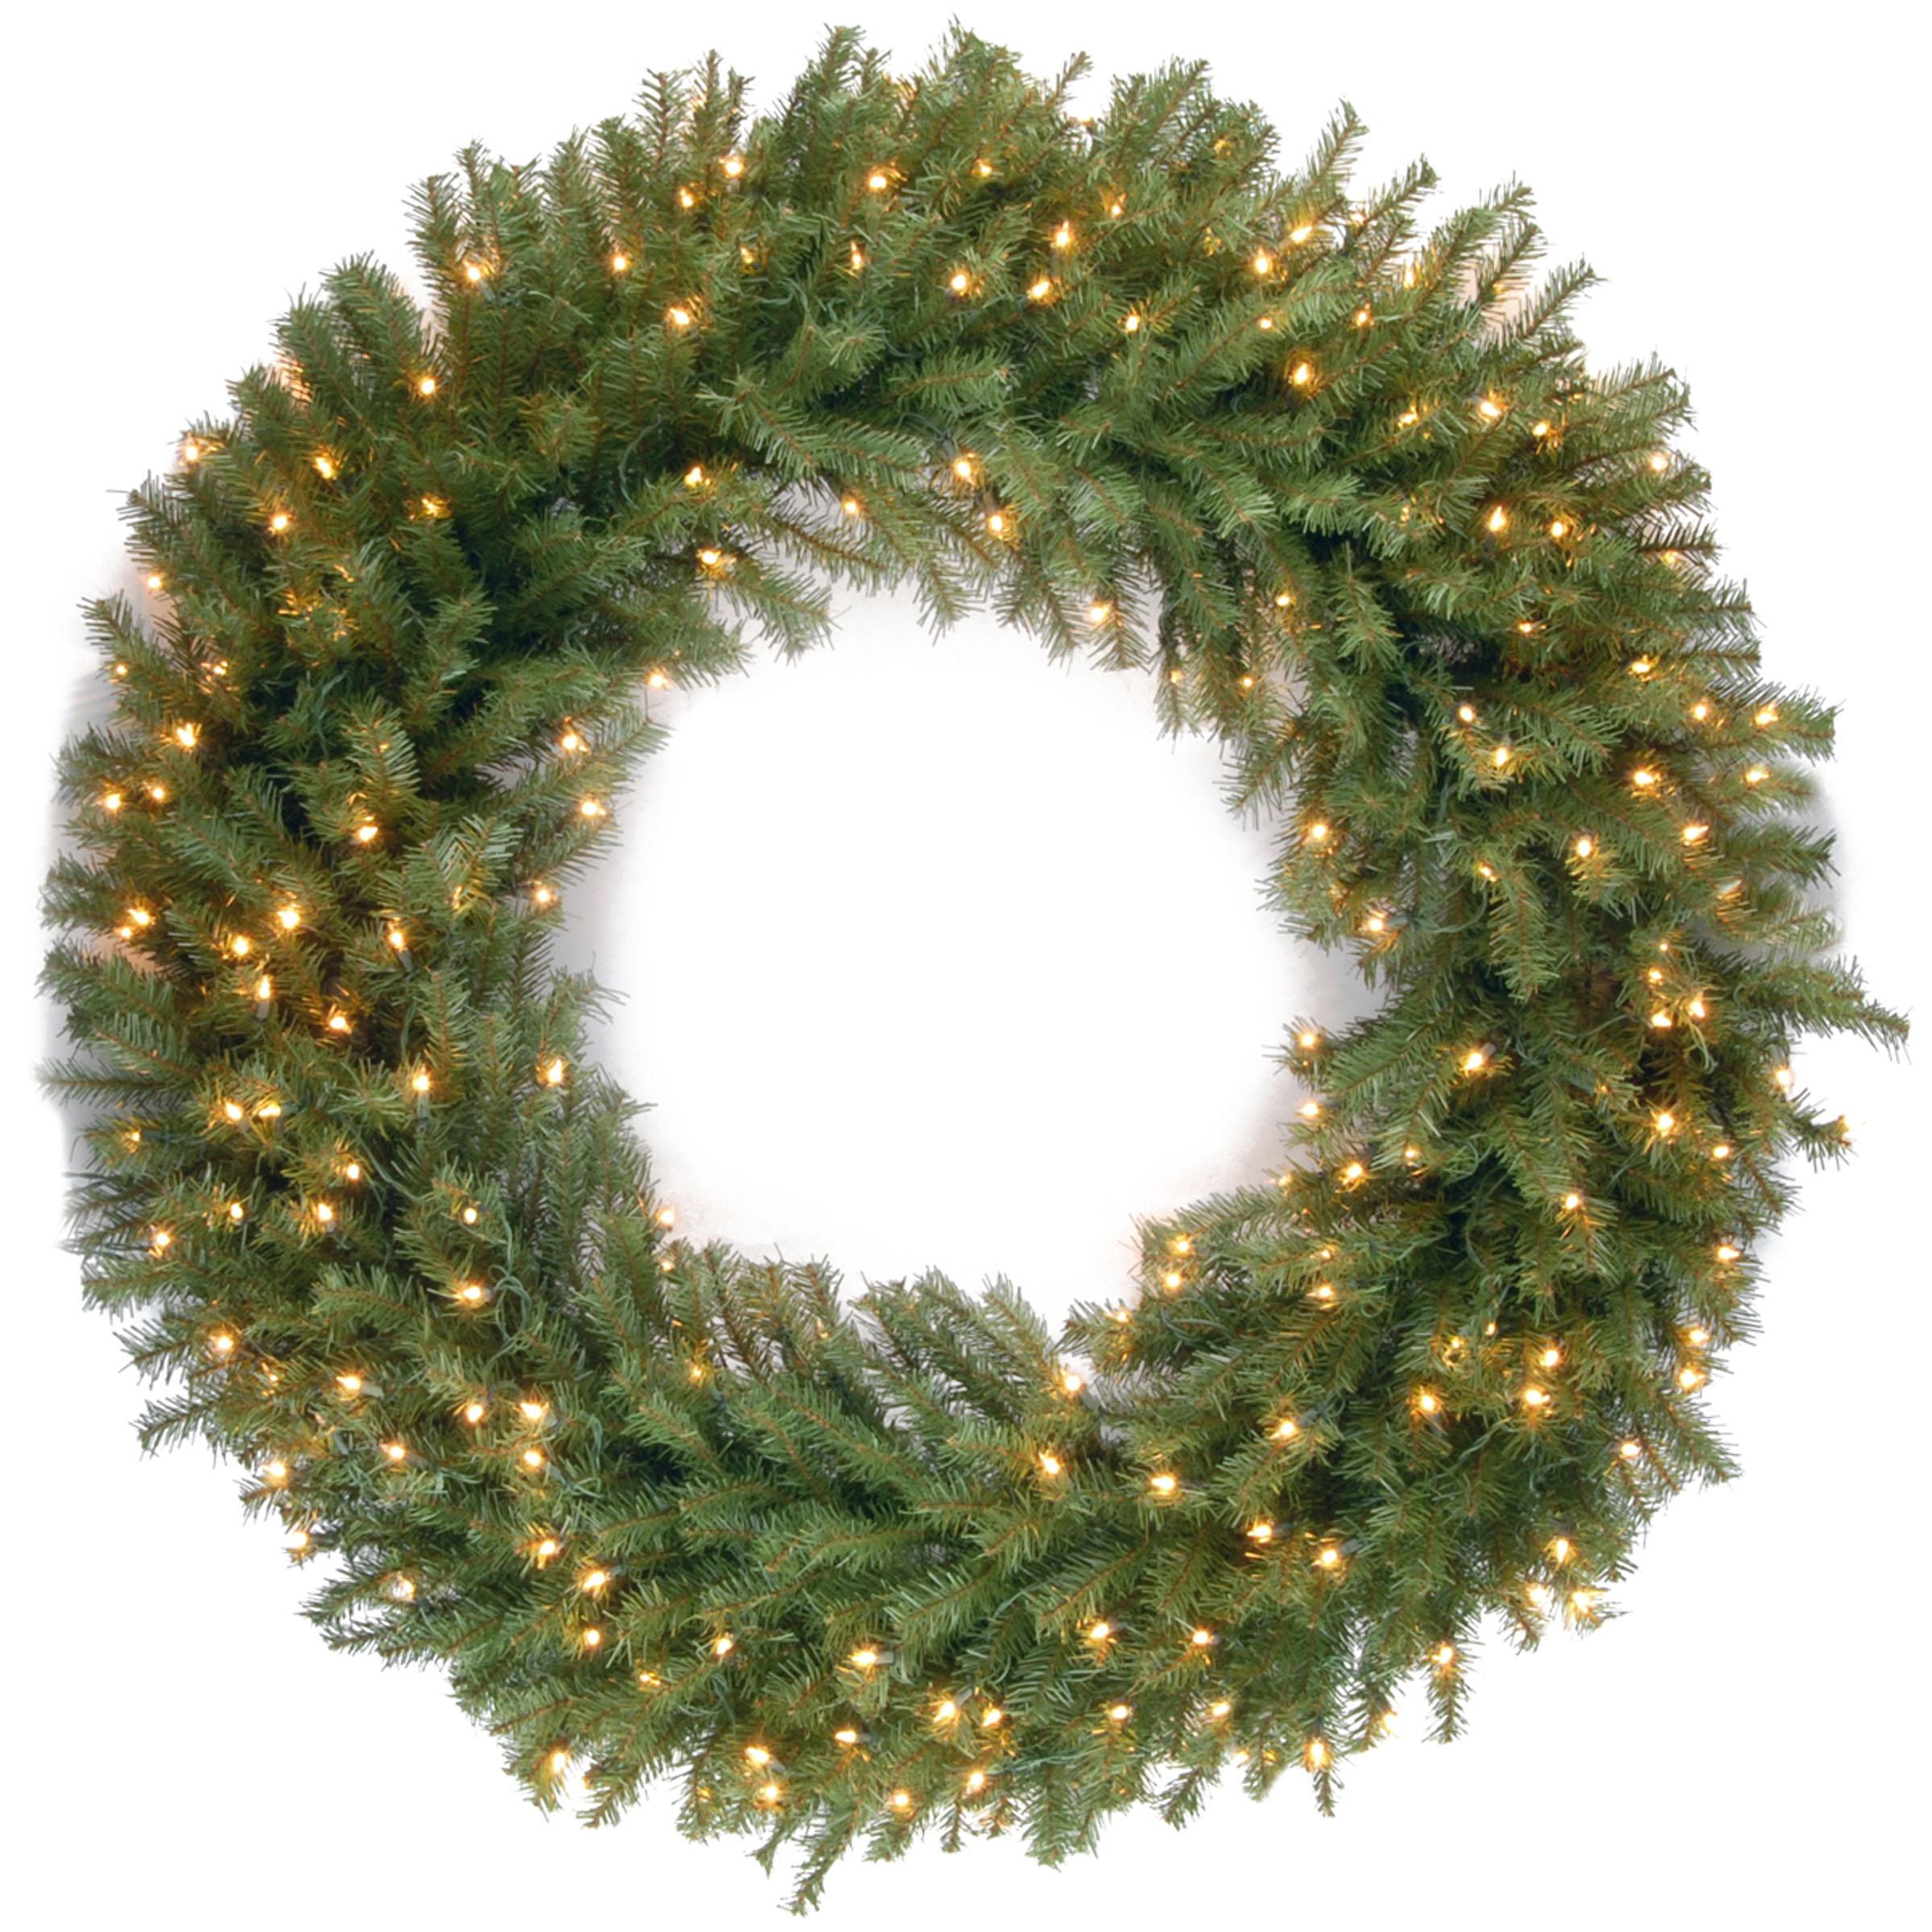 48 inch Norwood Fir Wreath: Warm White LED Lights NF-318L-48W